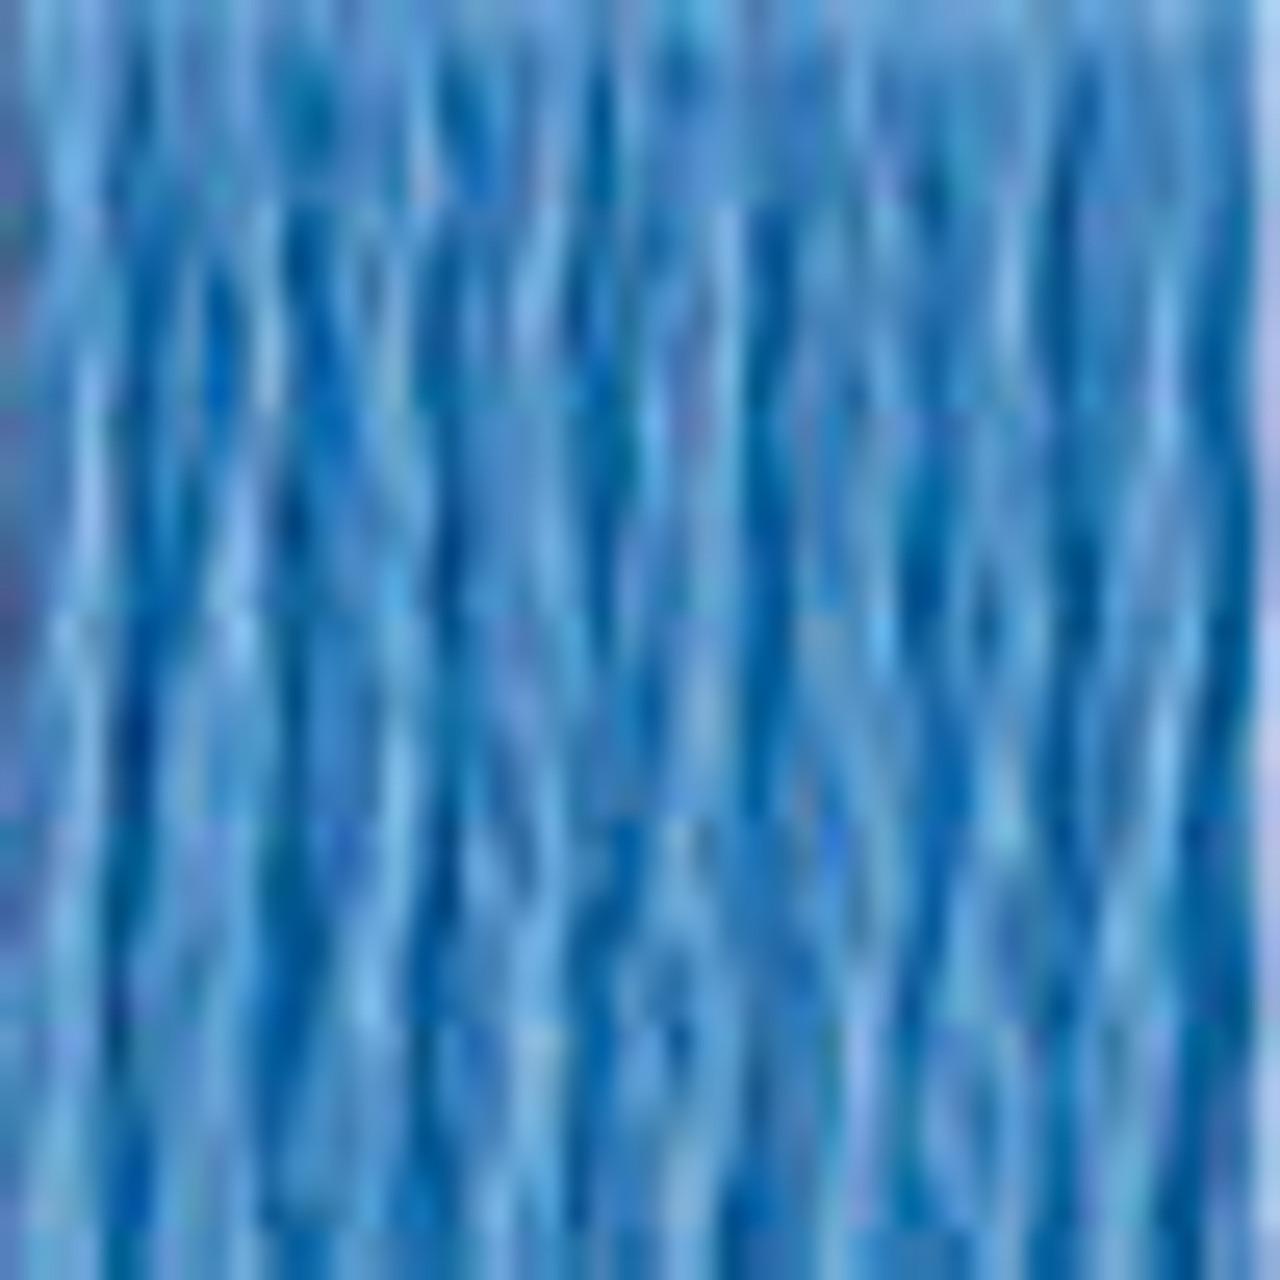 DMC # 322 Dark Baby Blue Floss / Thread